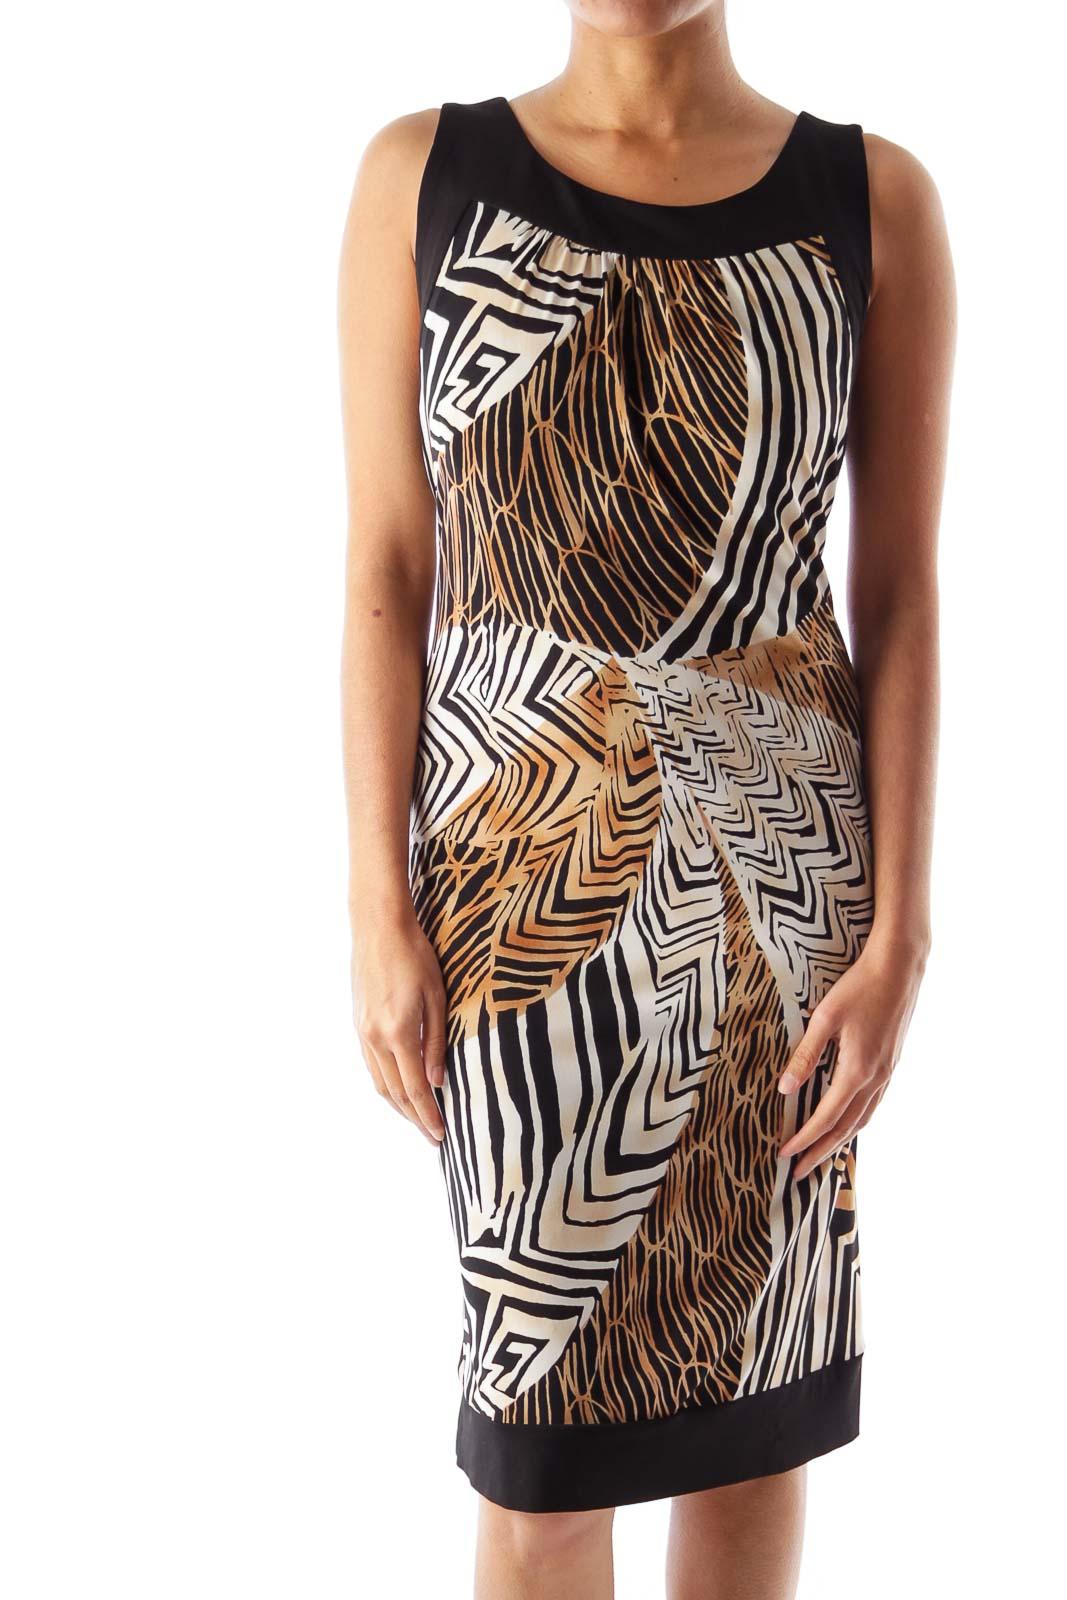 Animal Print Sleeveless Dress Front